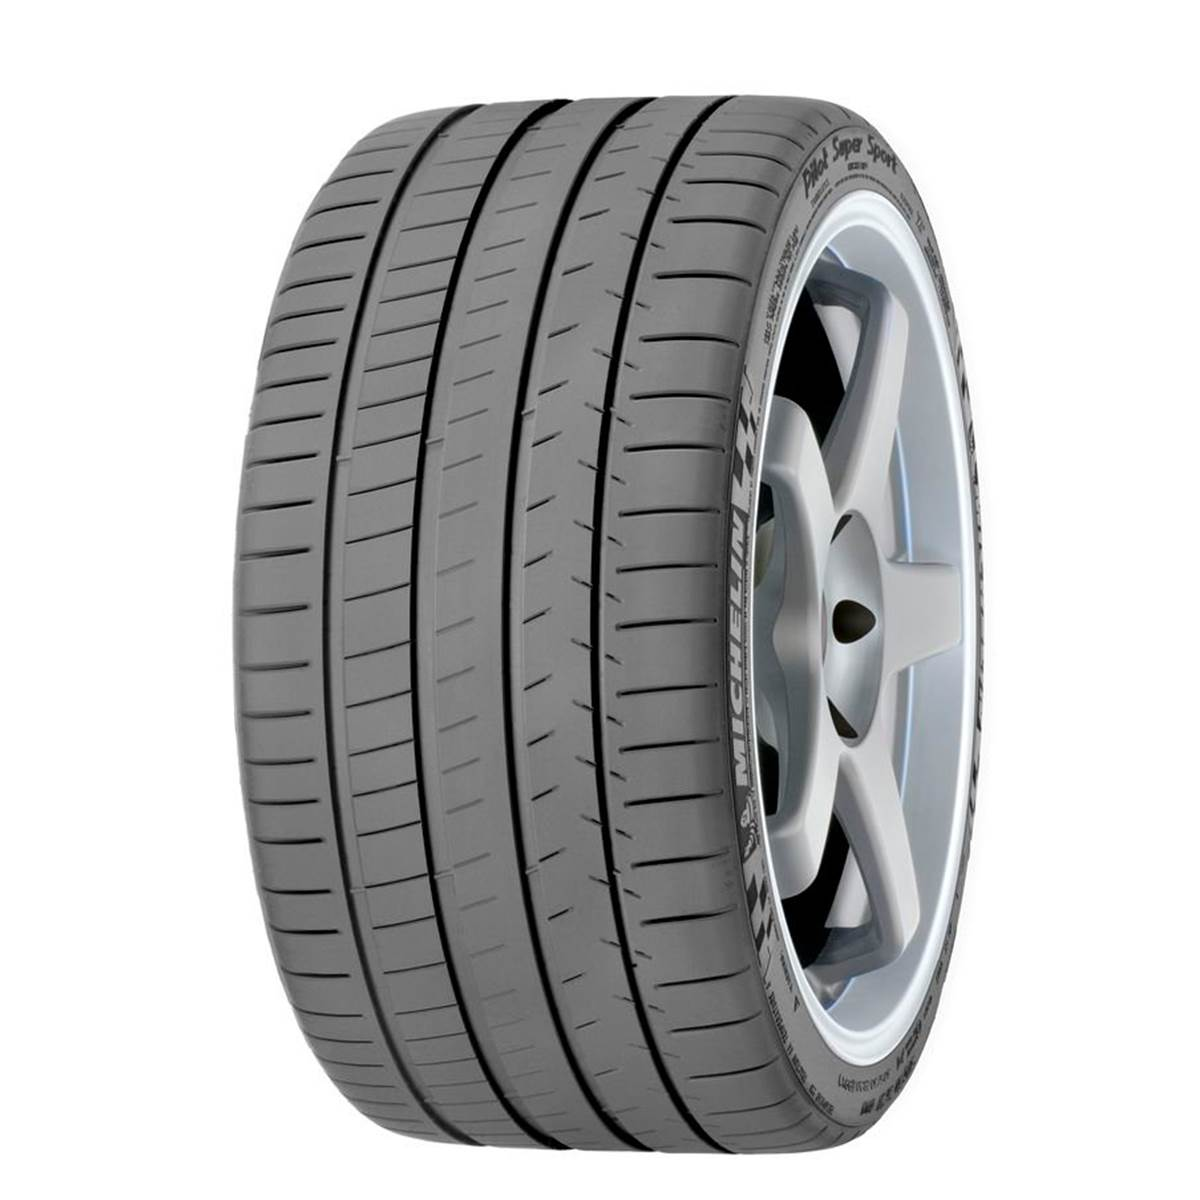 Pneu Michelin 285/30R21 100Y Pilot Super Sport XL